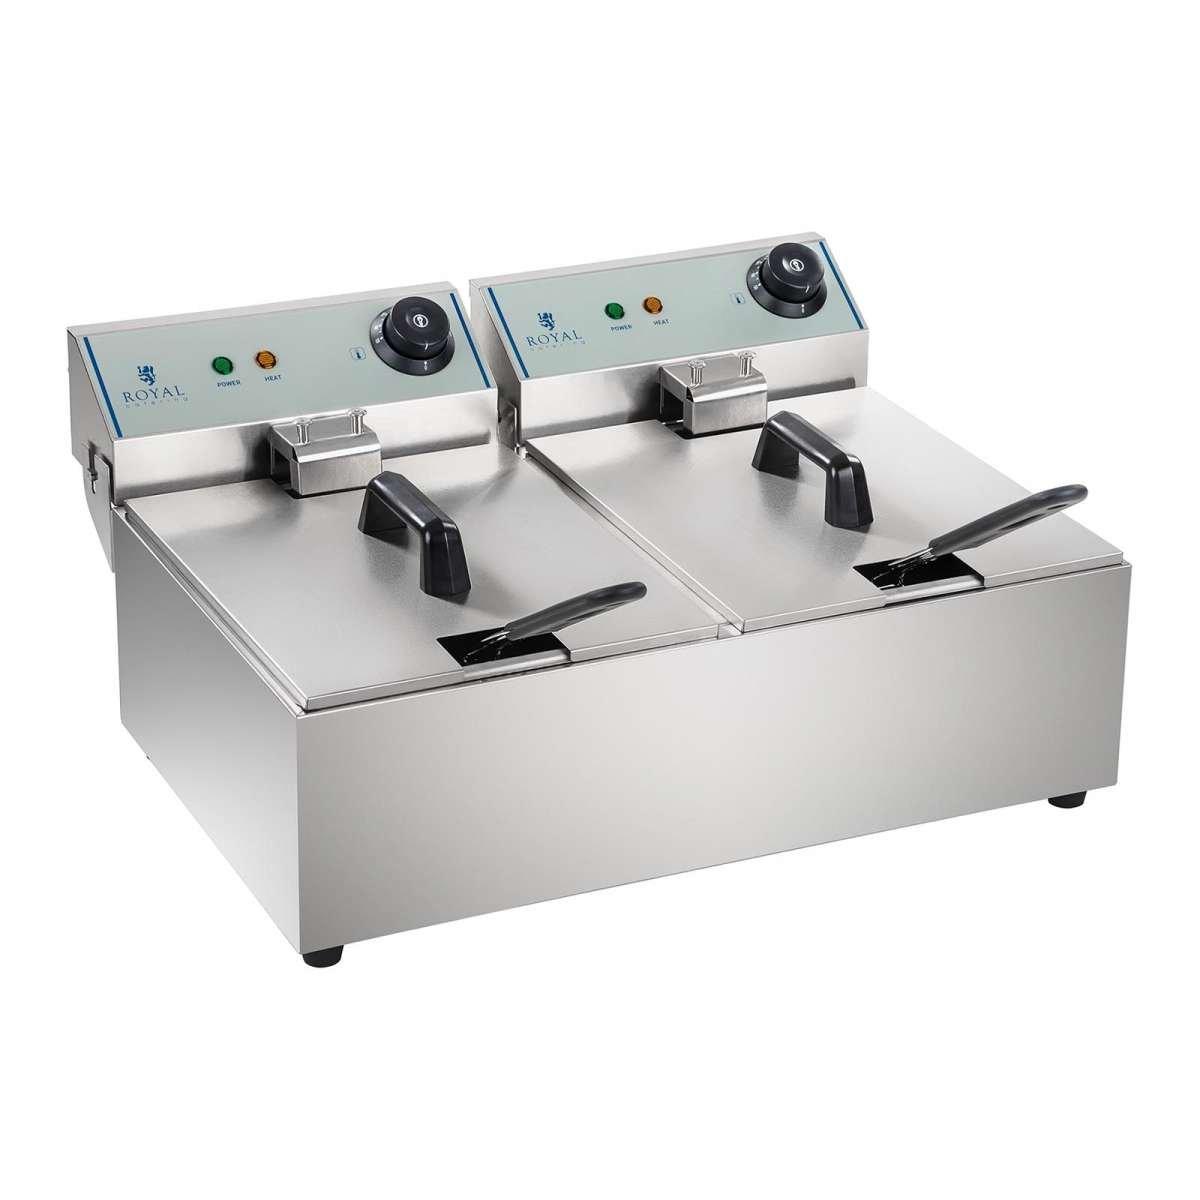 friteuse-elektrisch-2x8l-455